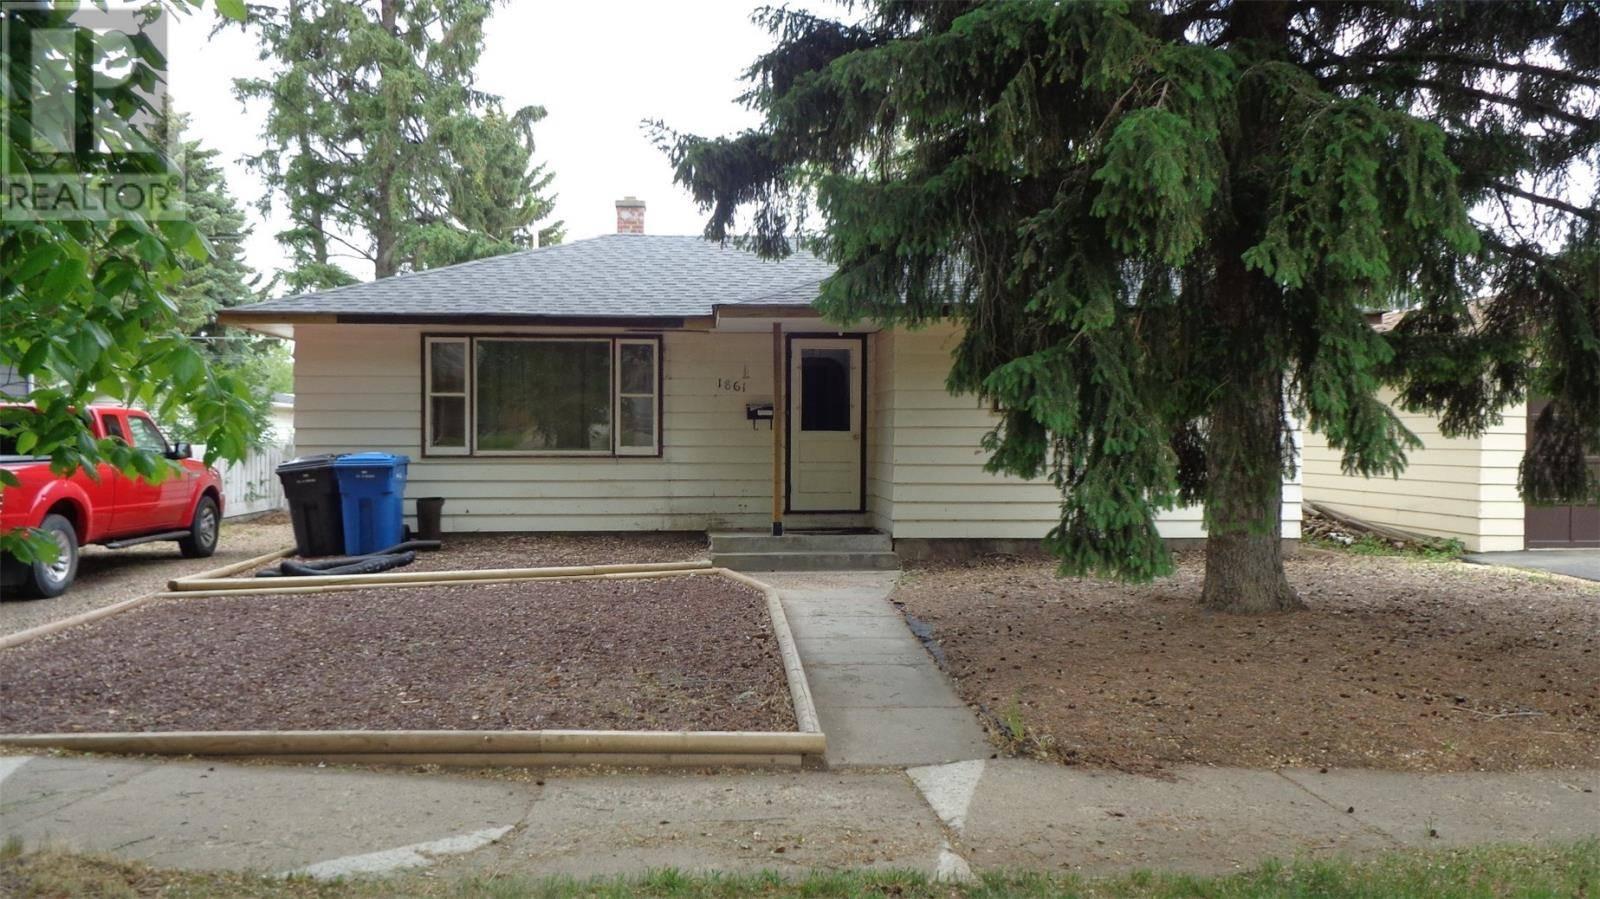 House for sale at 1861 97th St North Battleford Saskatchewan - MLS: SK776041